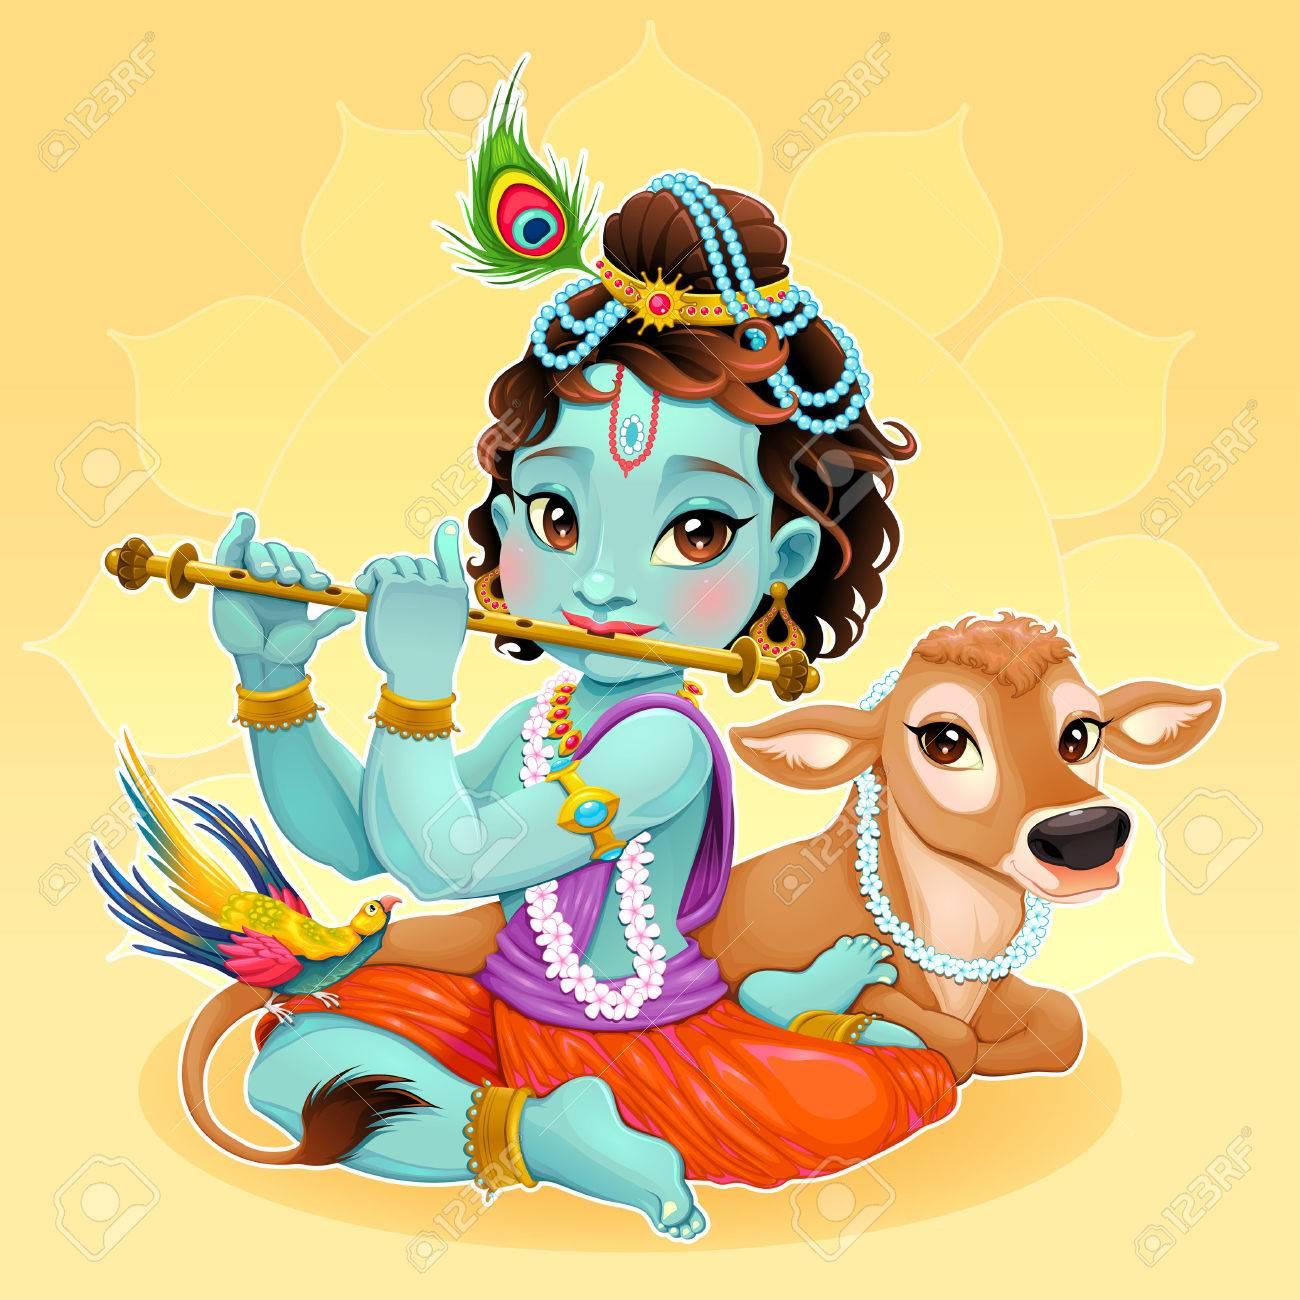 Krishna Art Stock Photos. Royalty Free Krishna Art Images